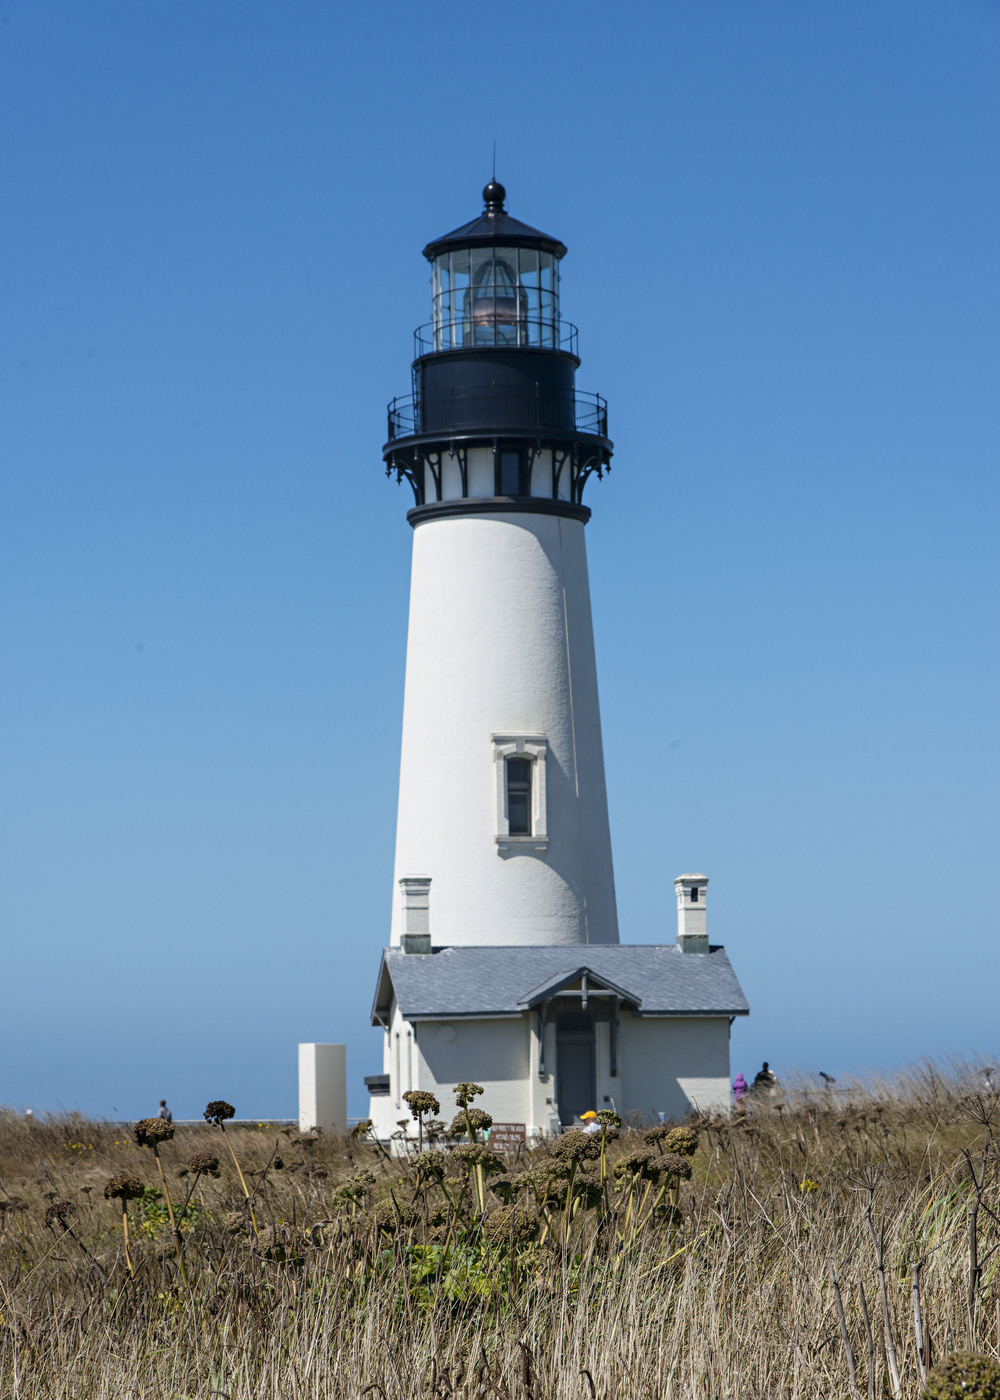 Yacquina Lighthouse. Nikon D800 Nikkor 24-120mm lens @ 86mm, f11, ISO 160, 1/400 sec.